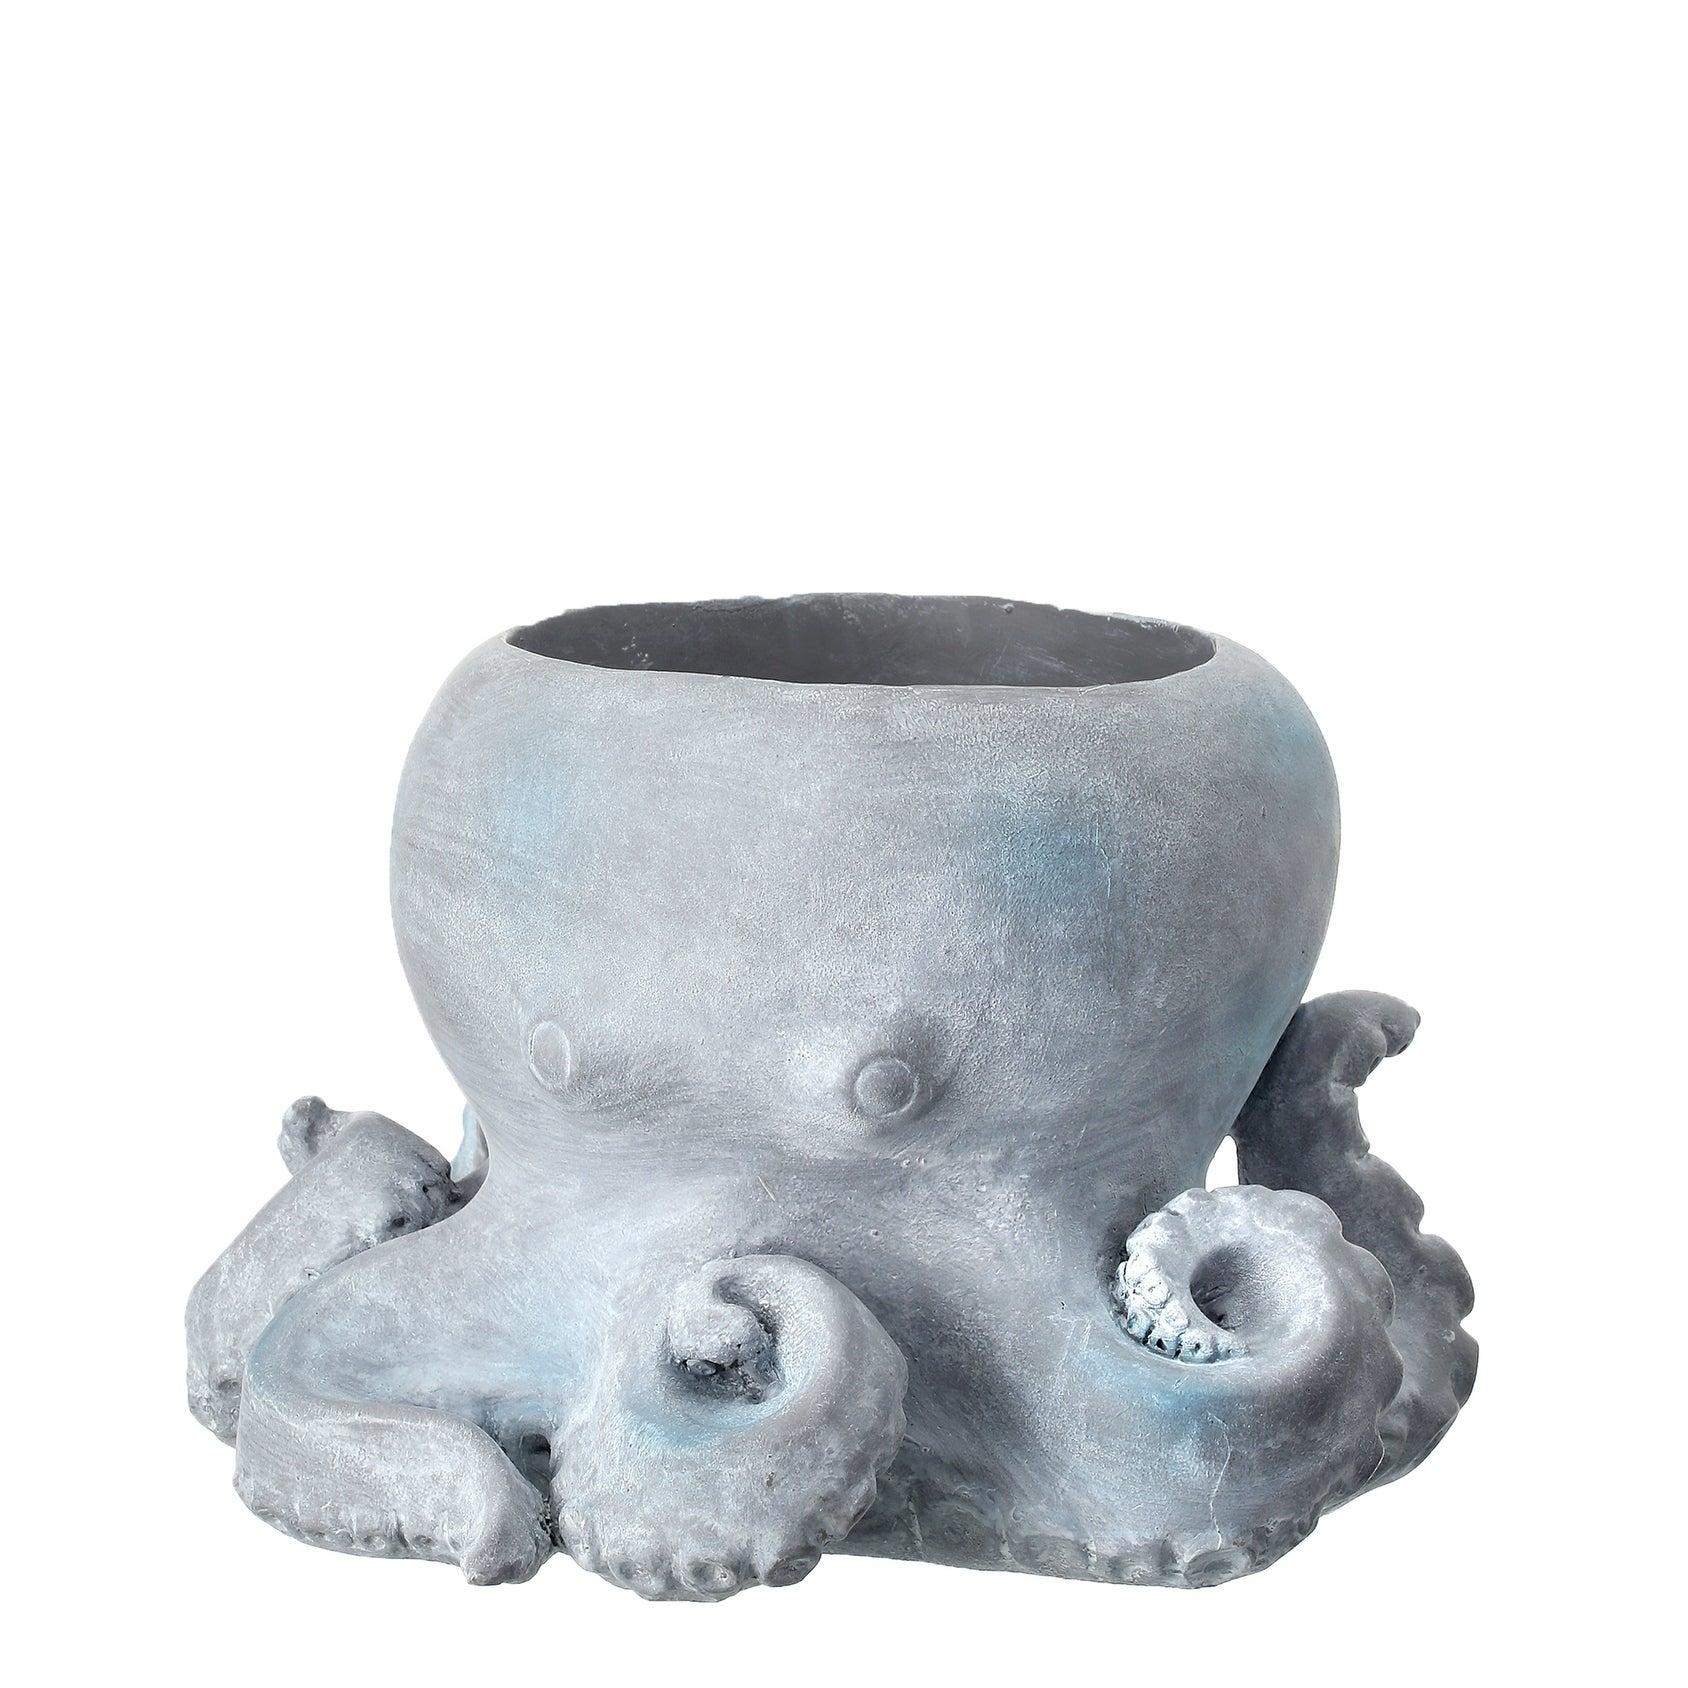 Octopus Stone Planter 10 W X 8 H